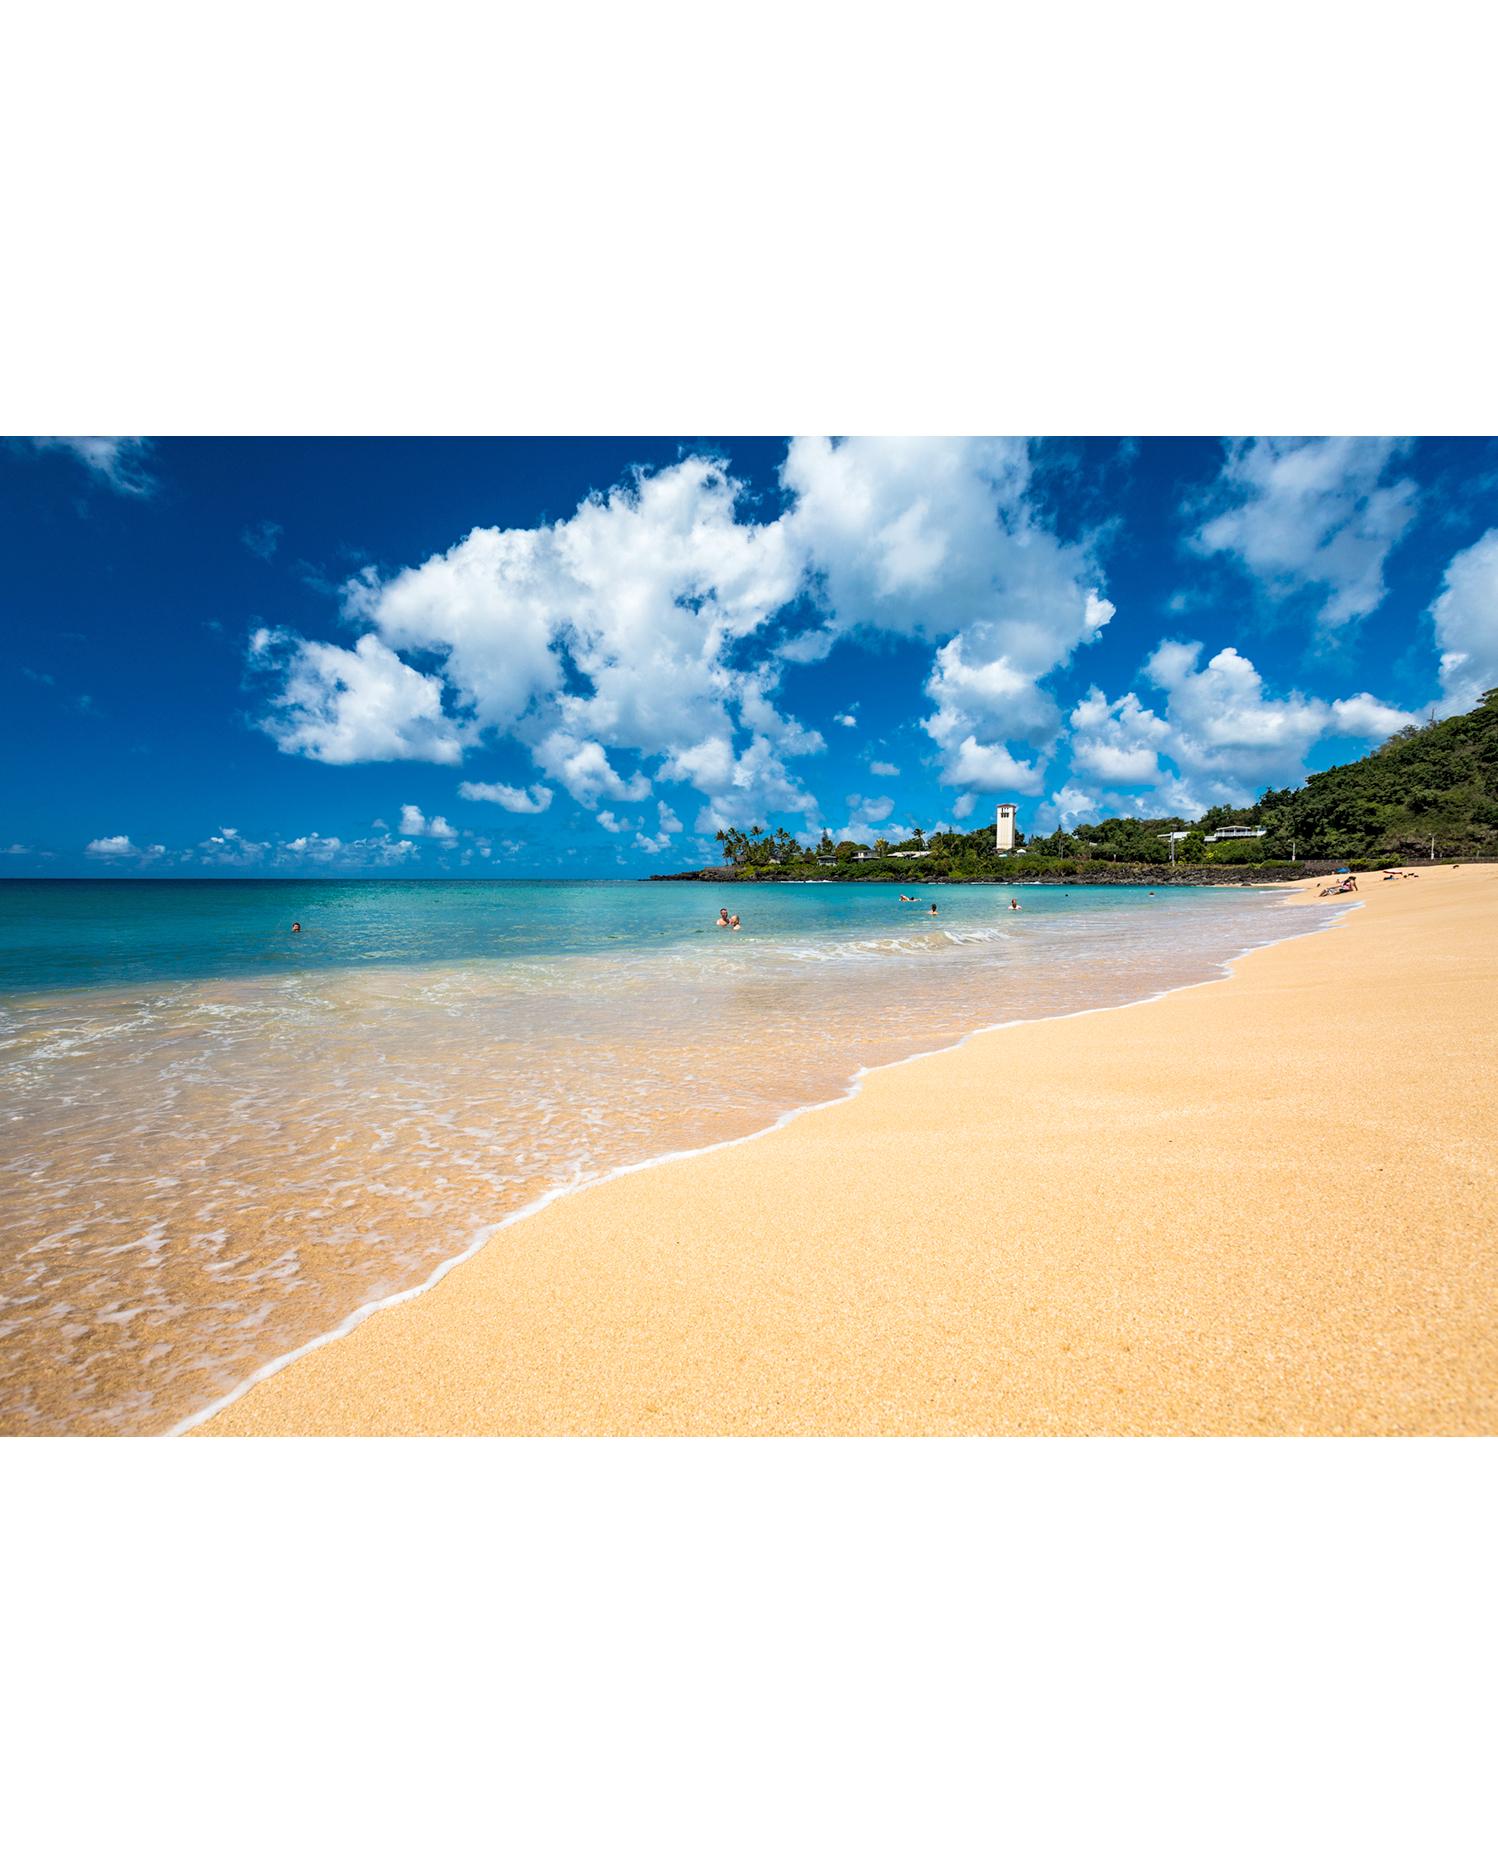 Waimea Bay Beach Park in Oahu, Hawaii